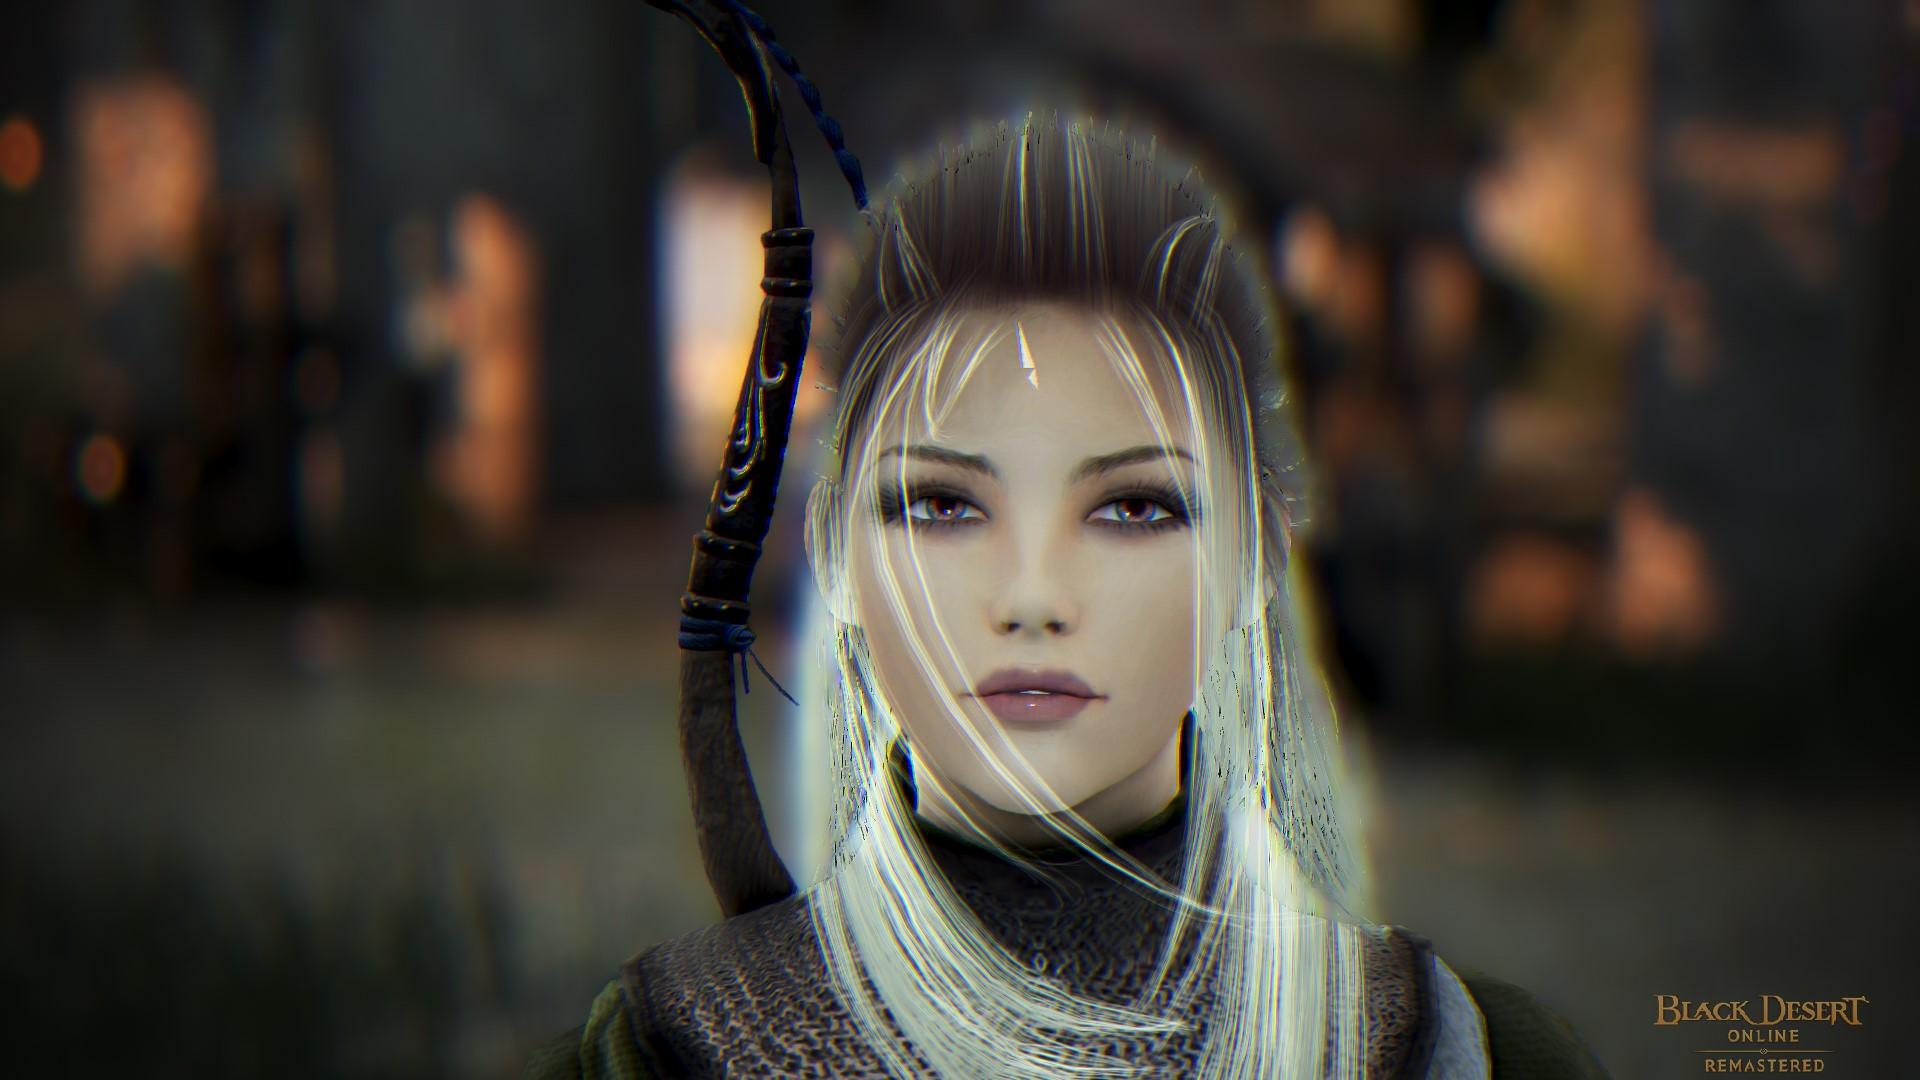 Black Desert Online - Maehwa